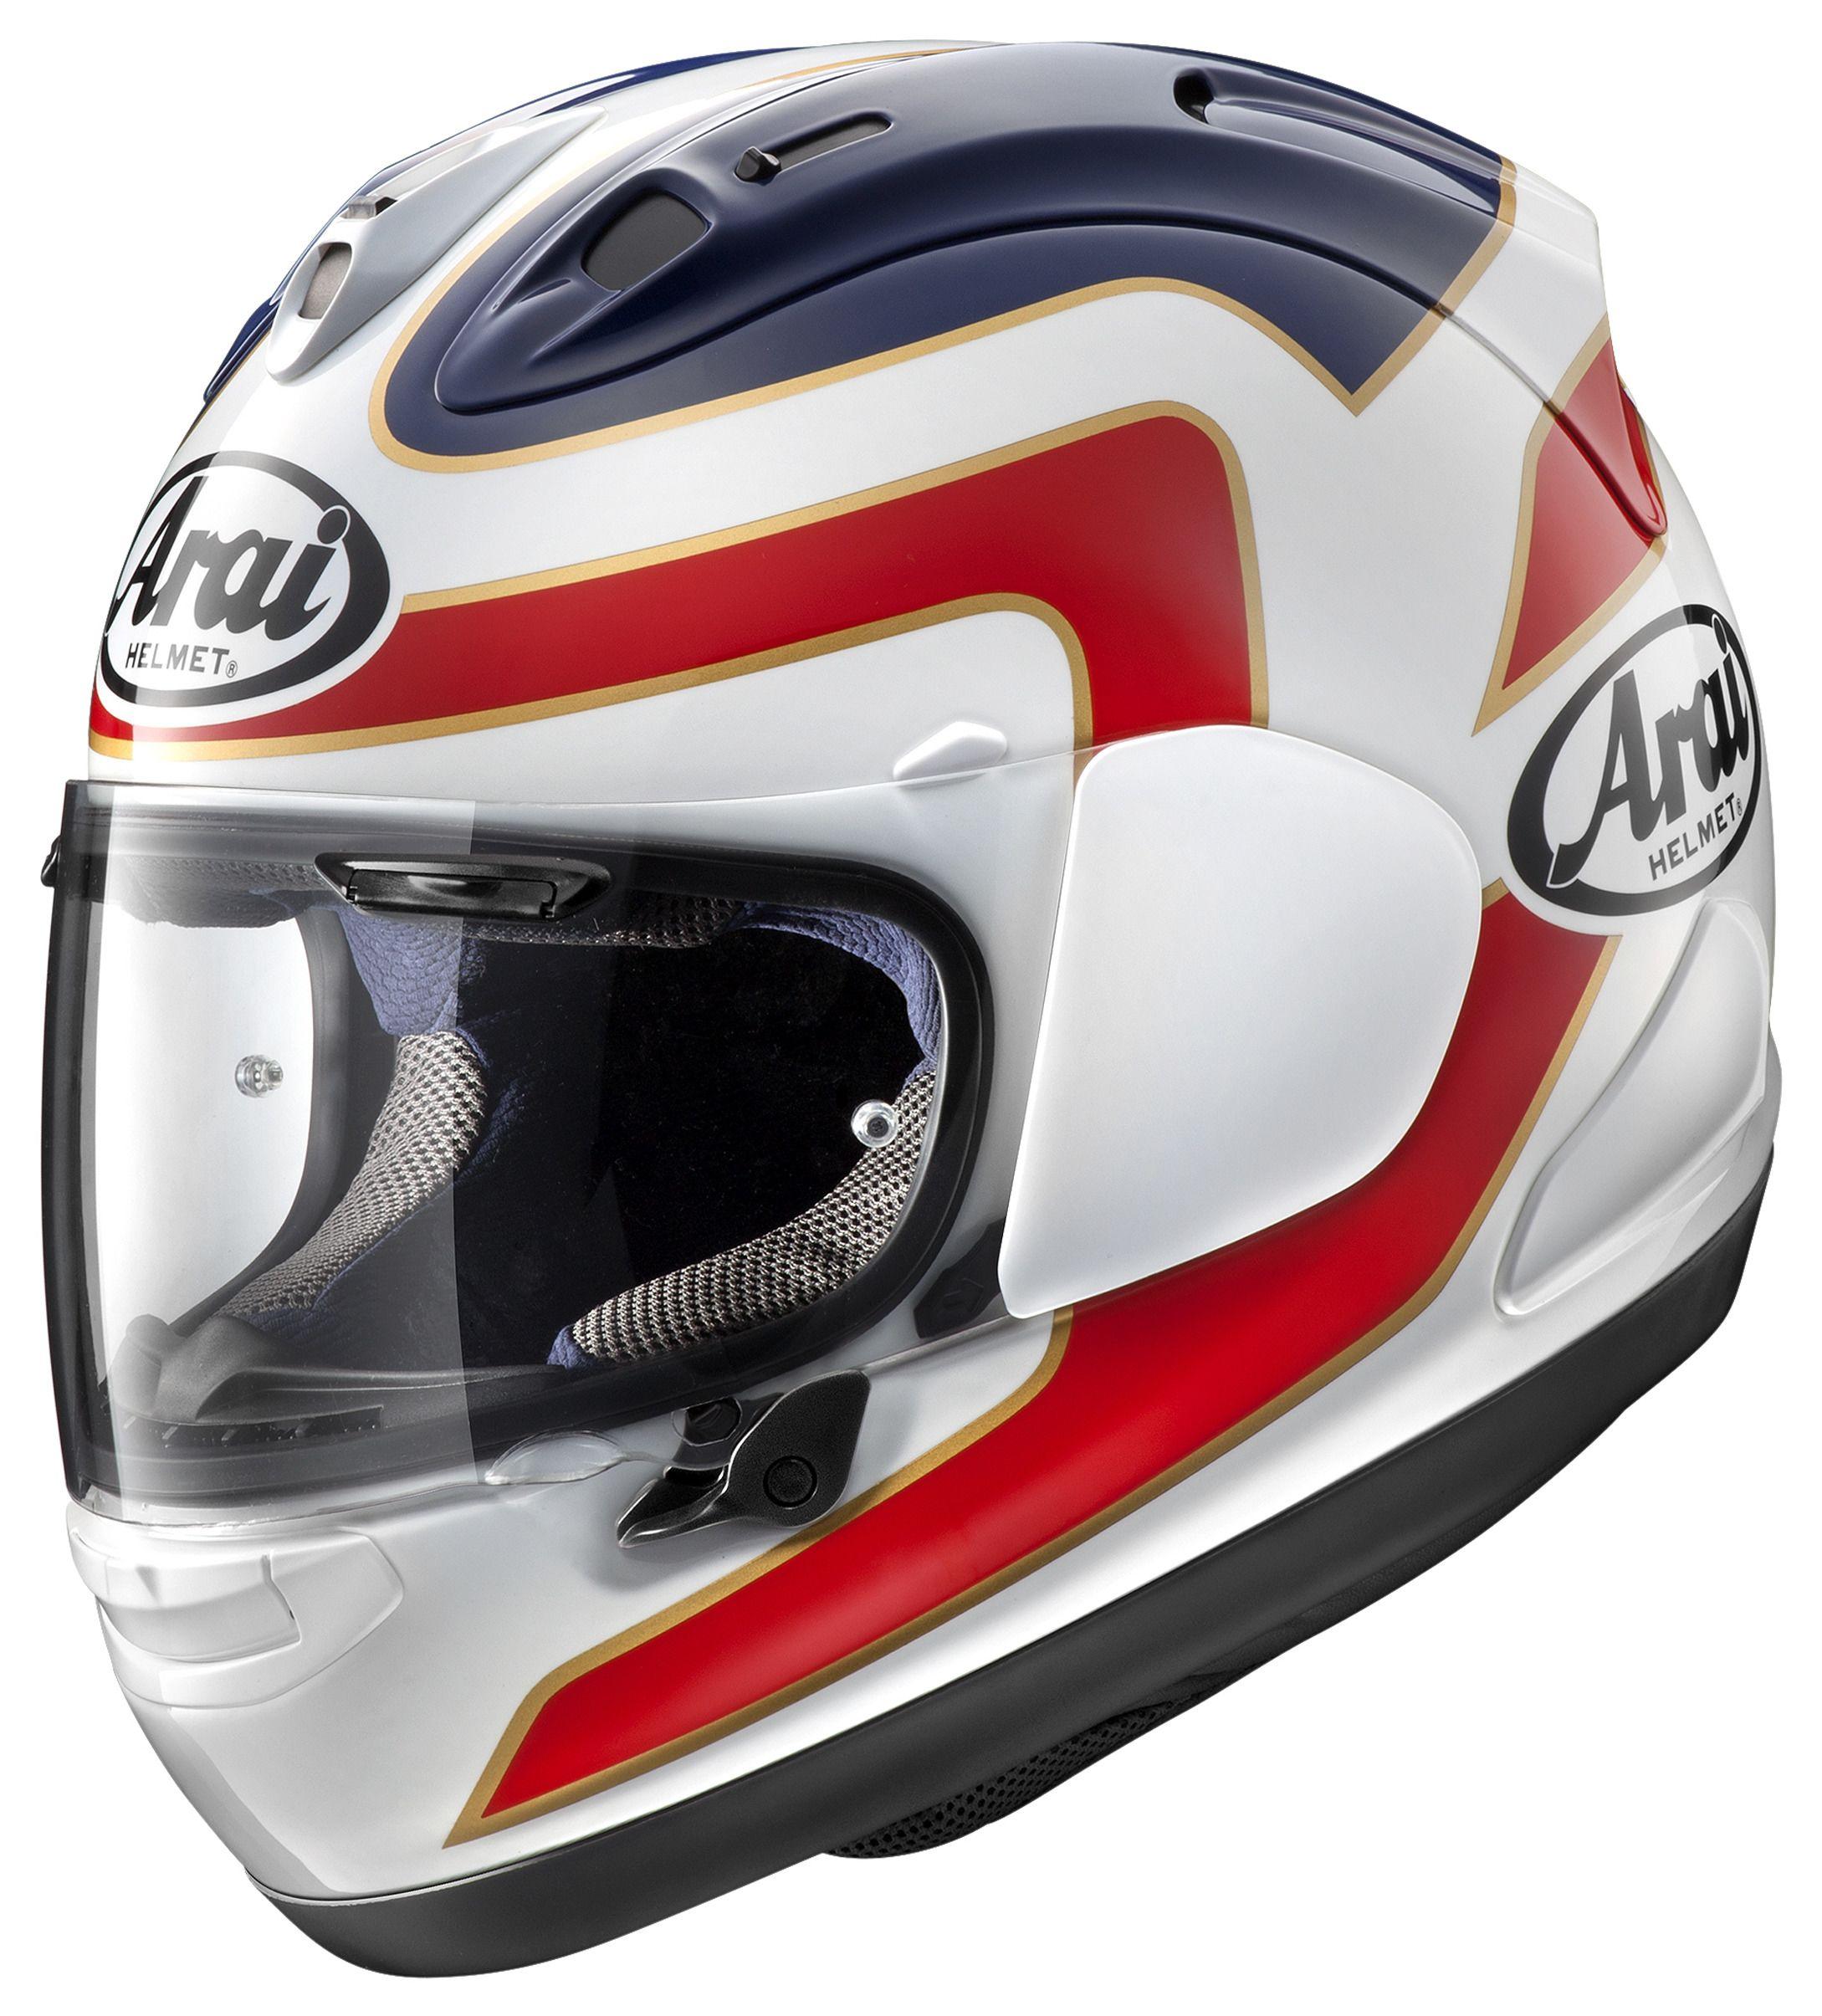 Arai corsair x spencer helmet 10 off revzilla for Ecran photochromique arai